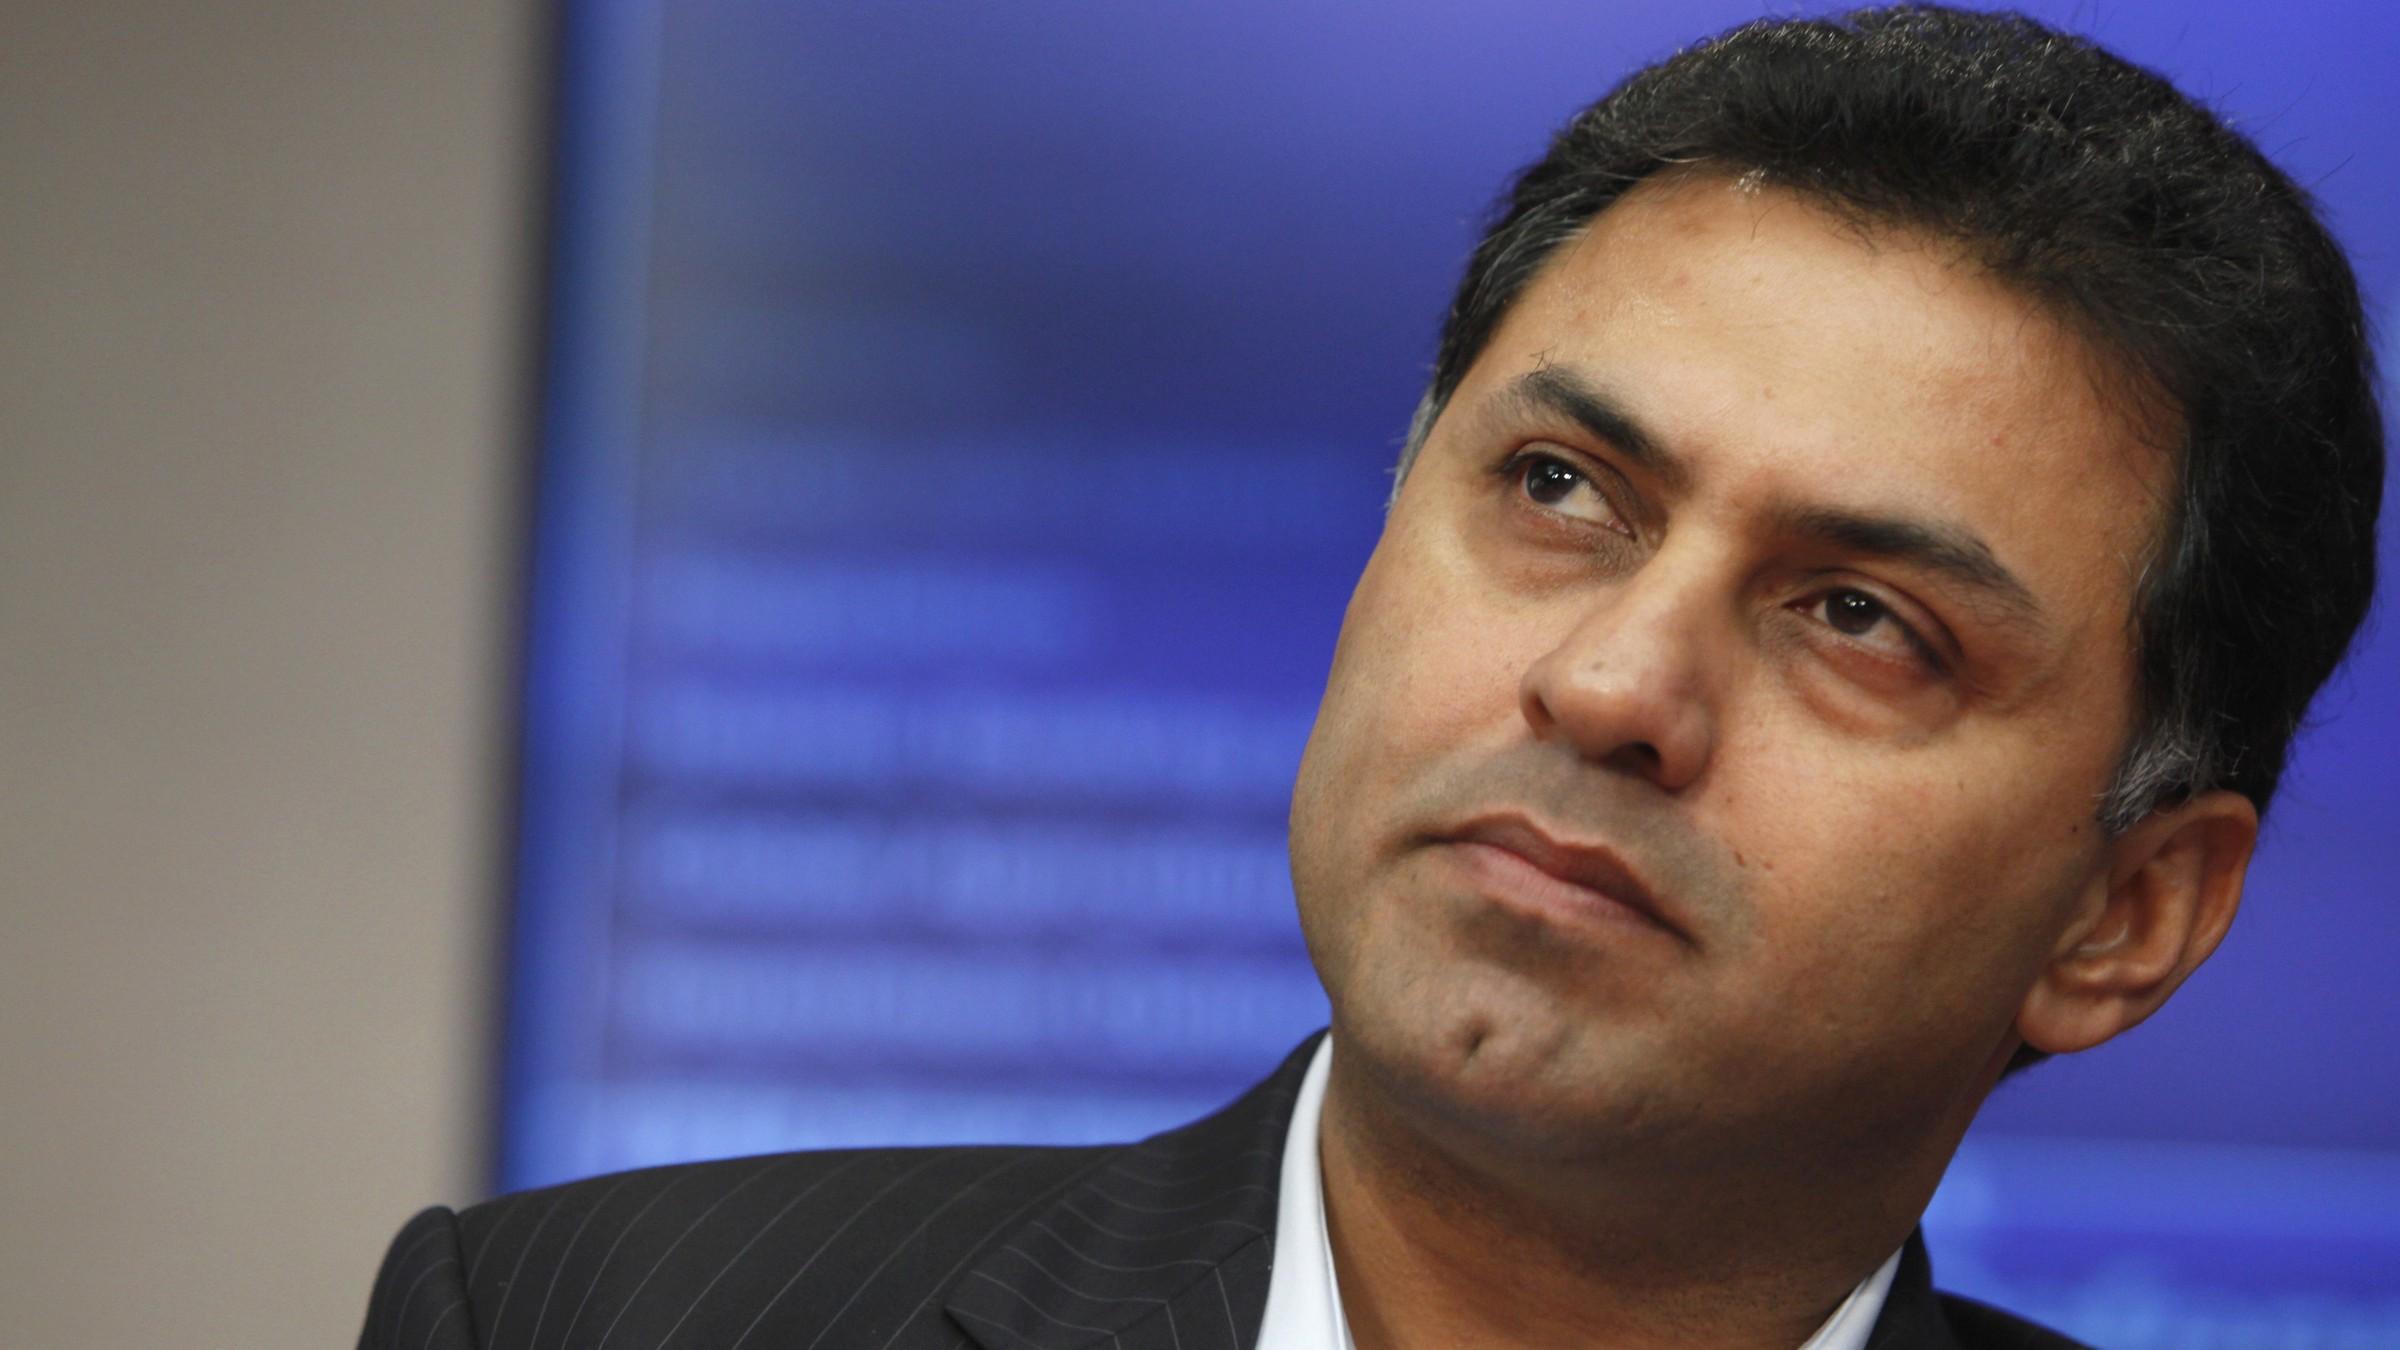 Google executive Nikesh Arora